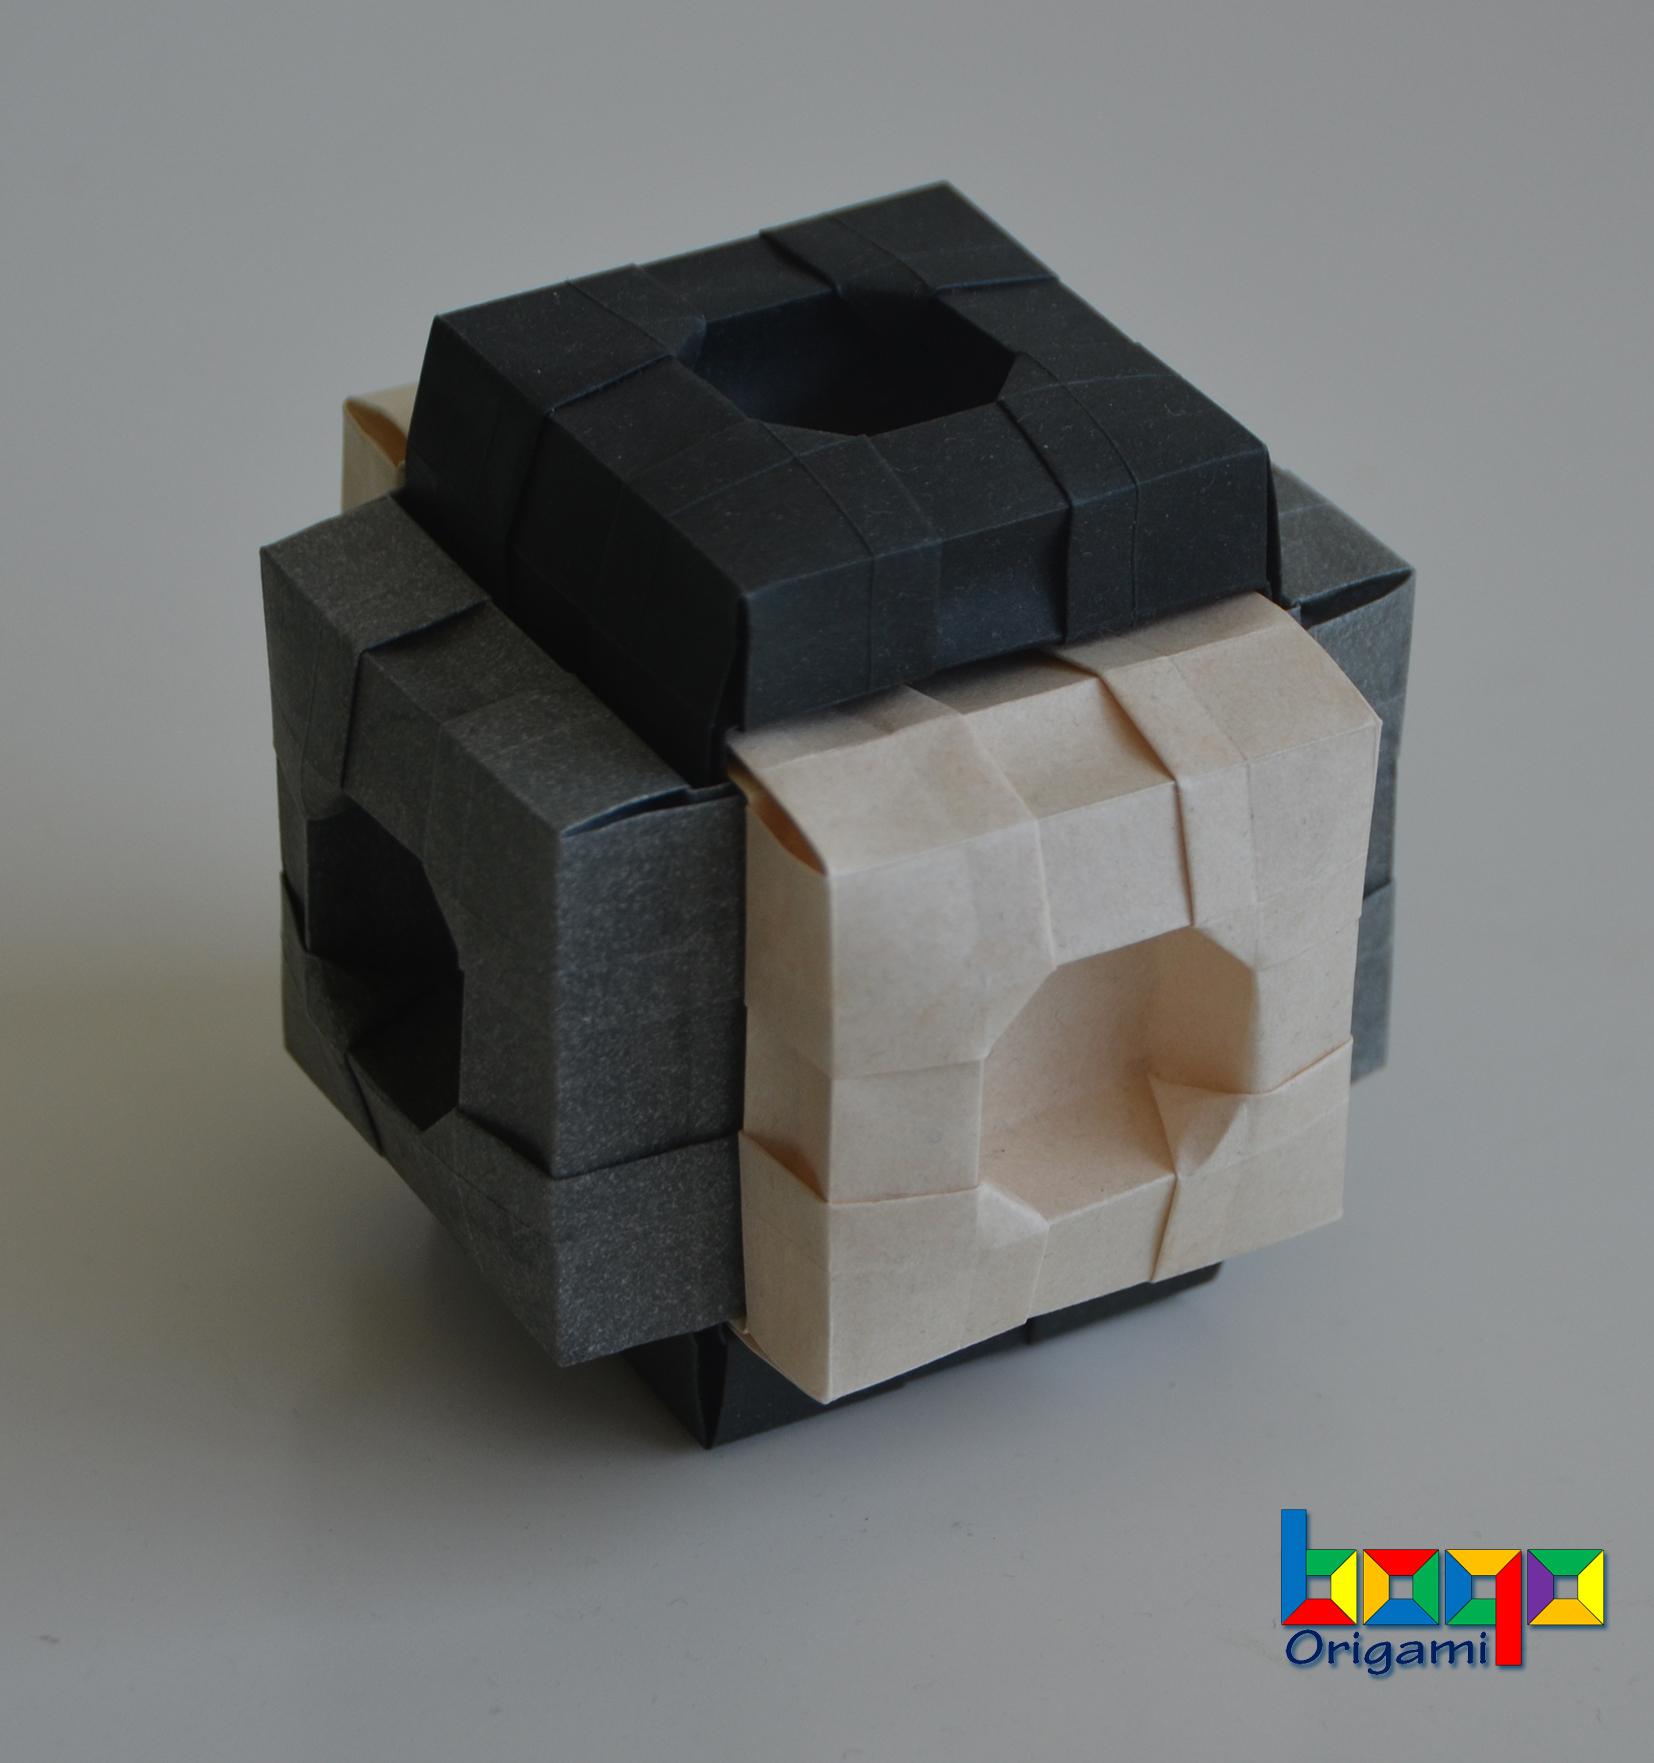 Modular Cube - 1 elephant hide